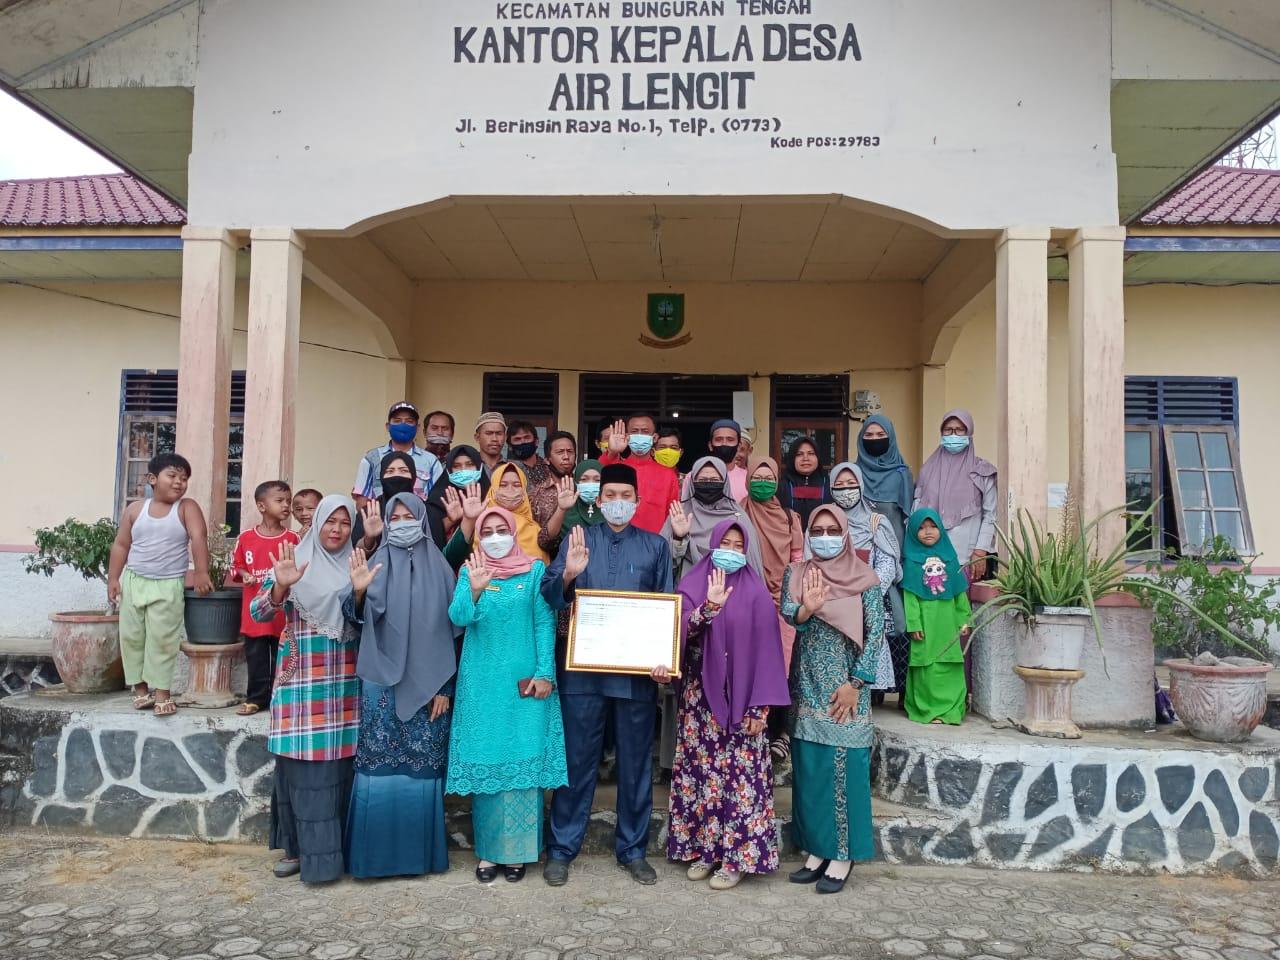 Kadis P3P2KB Sosialisasikan Desa Ramah Perempuan dan Peduli Anak Untuk Meningkatkan Kesejahteraan dan Kesehatan Masyarakat